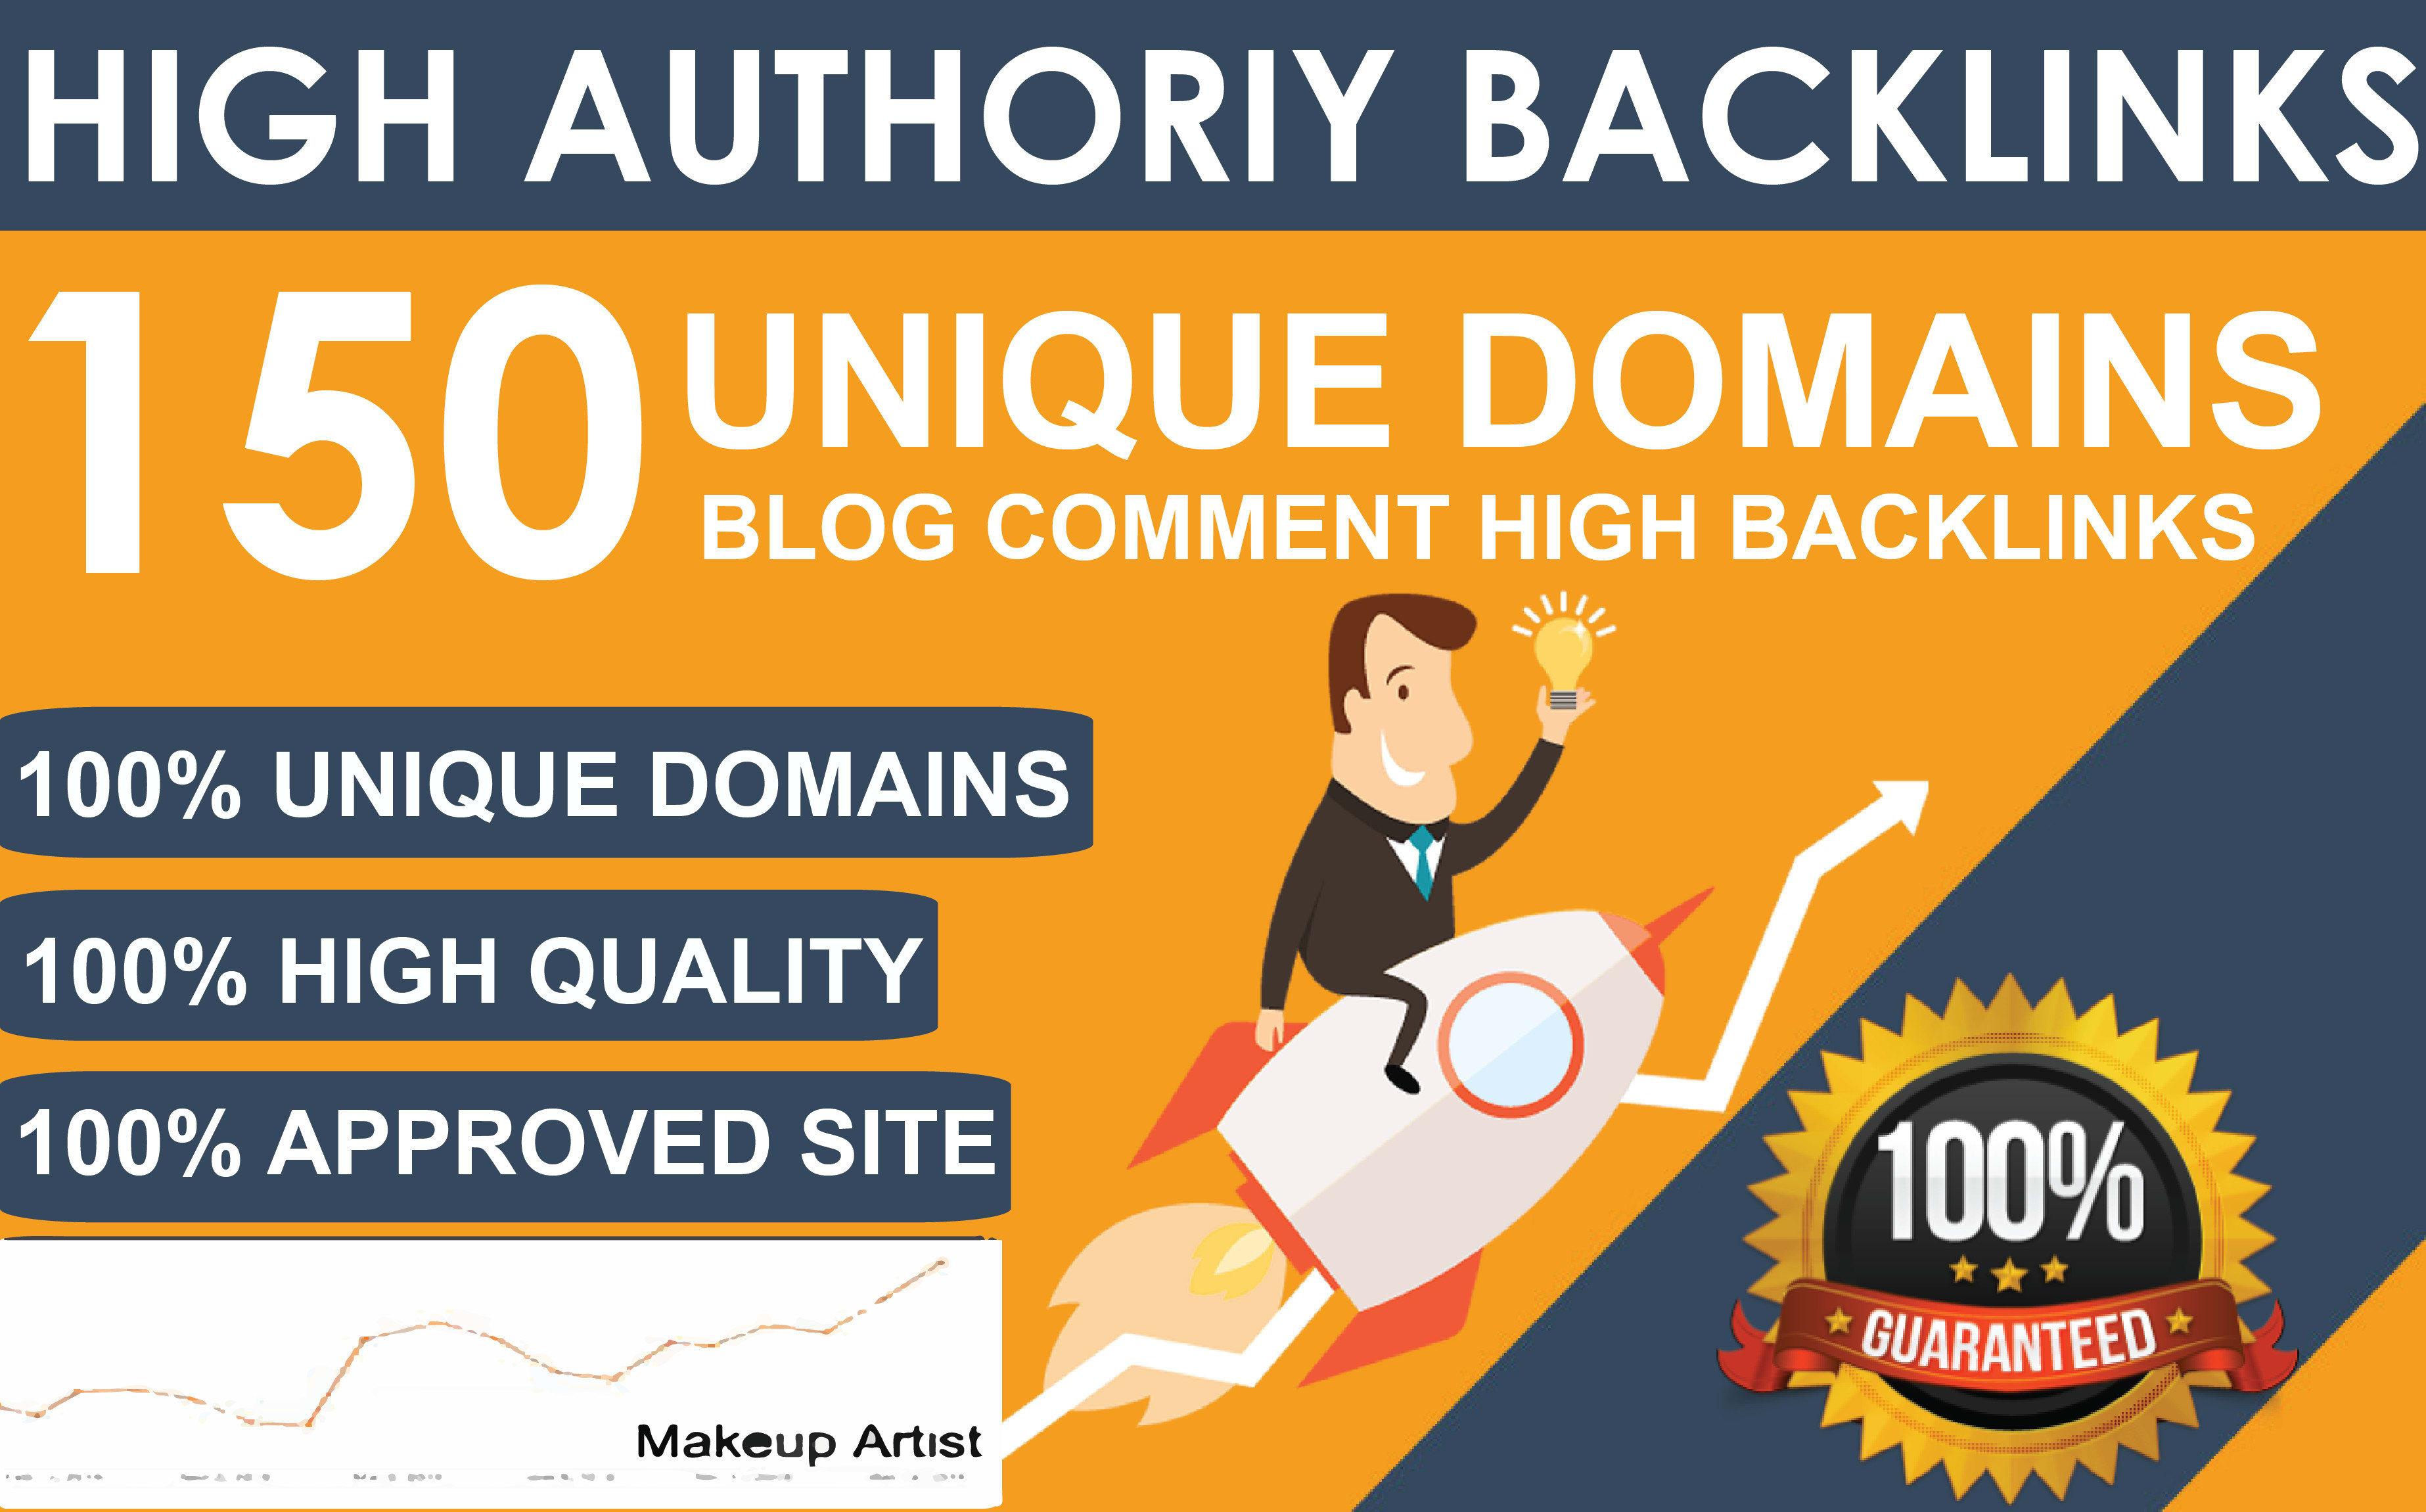 150 Unique Domains Blog Commenting Dofollow Backlinks High DA PA google Rank Obl Low Website Traffic